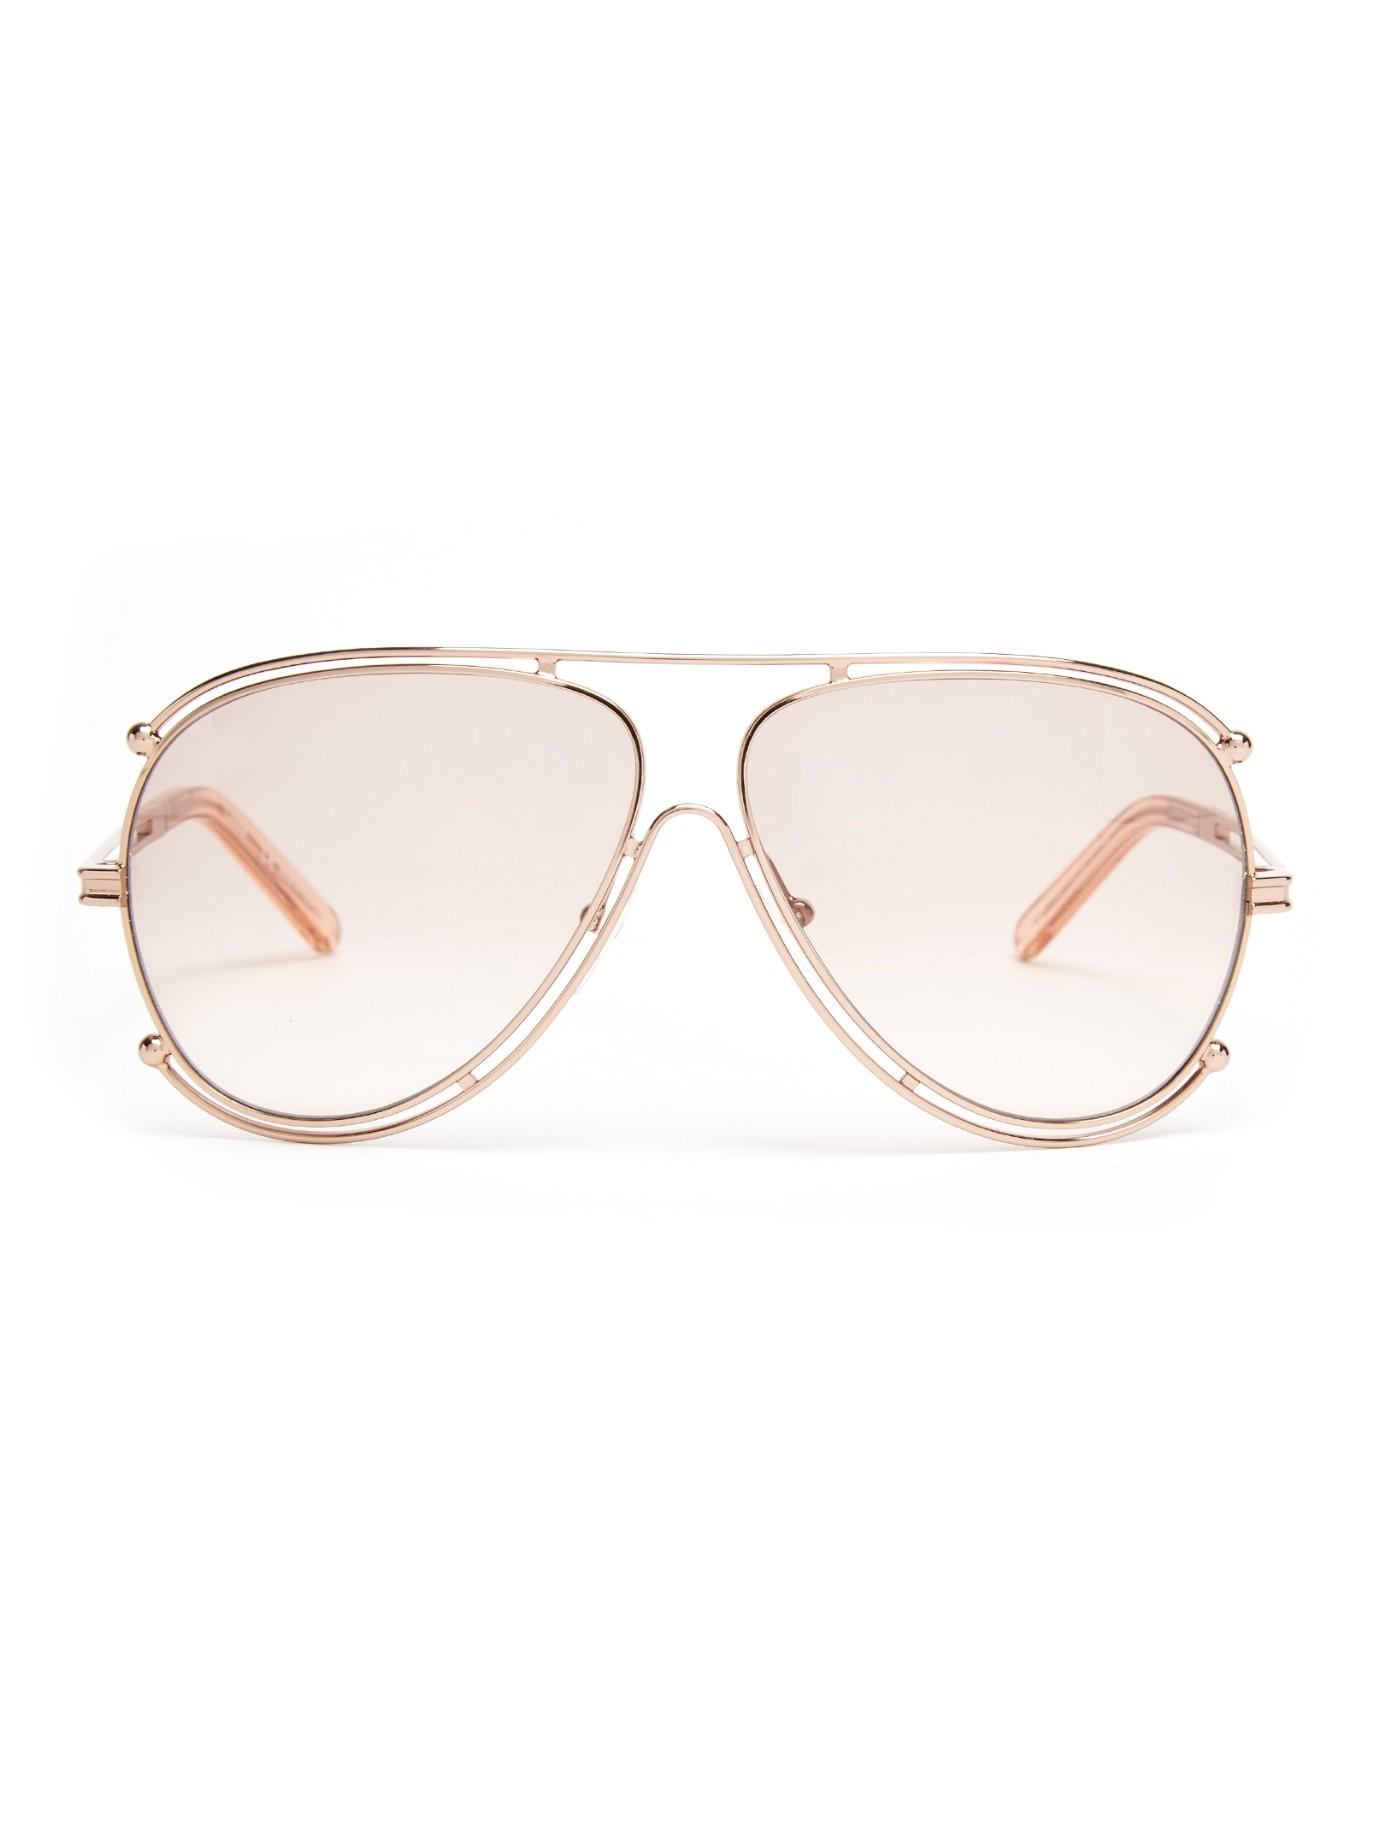 fc3259728cc Chloé Isidora Aviator Sunglasses in Pink - Lyst